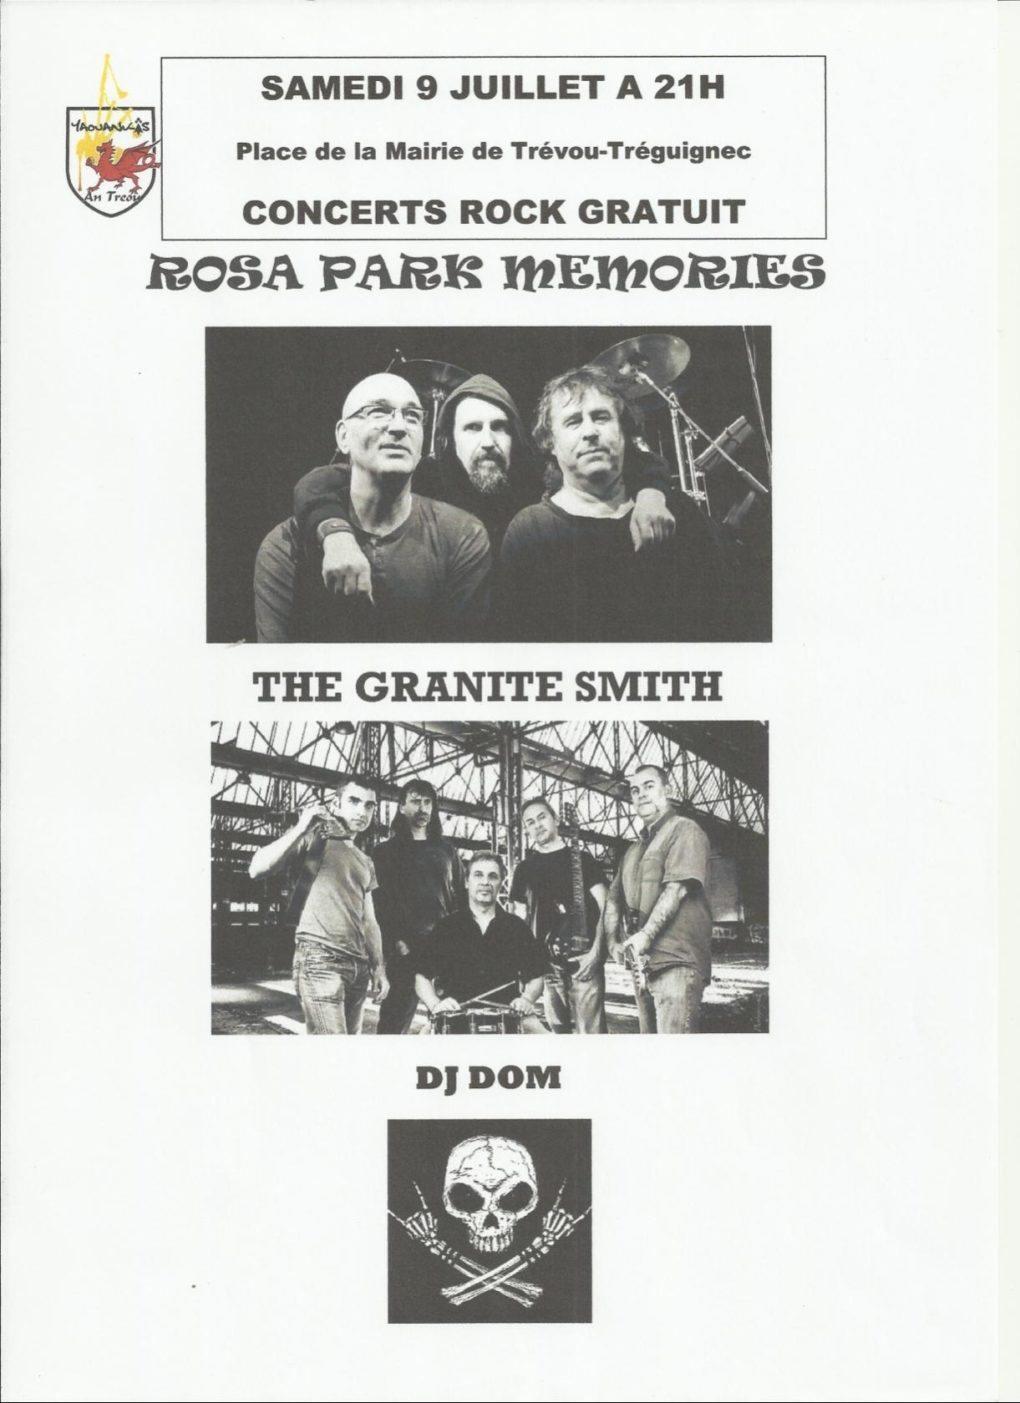 Rosa Parks Memories The granite Smith et Dj DOM Trévou-Tréguignec